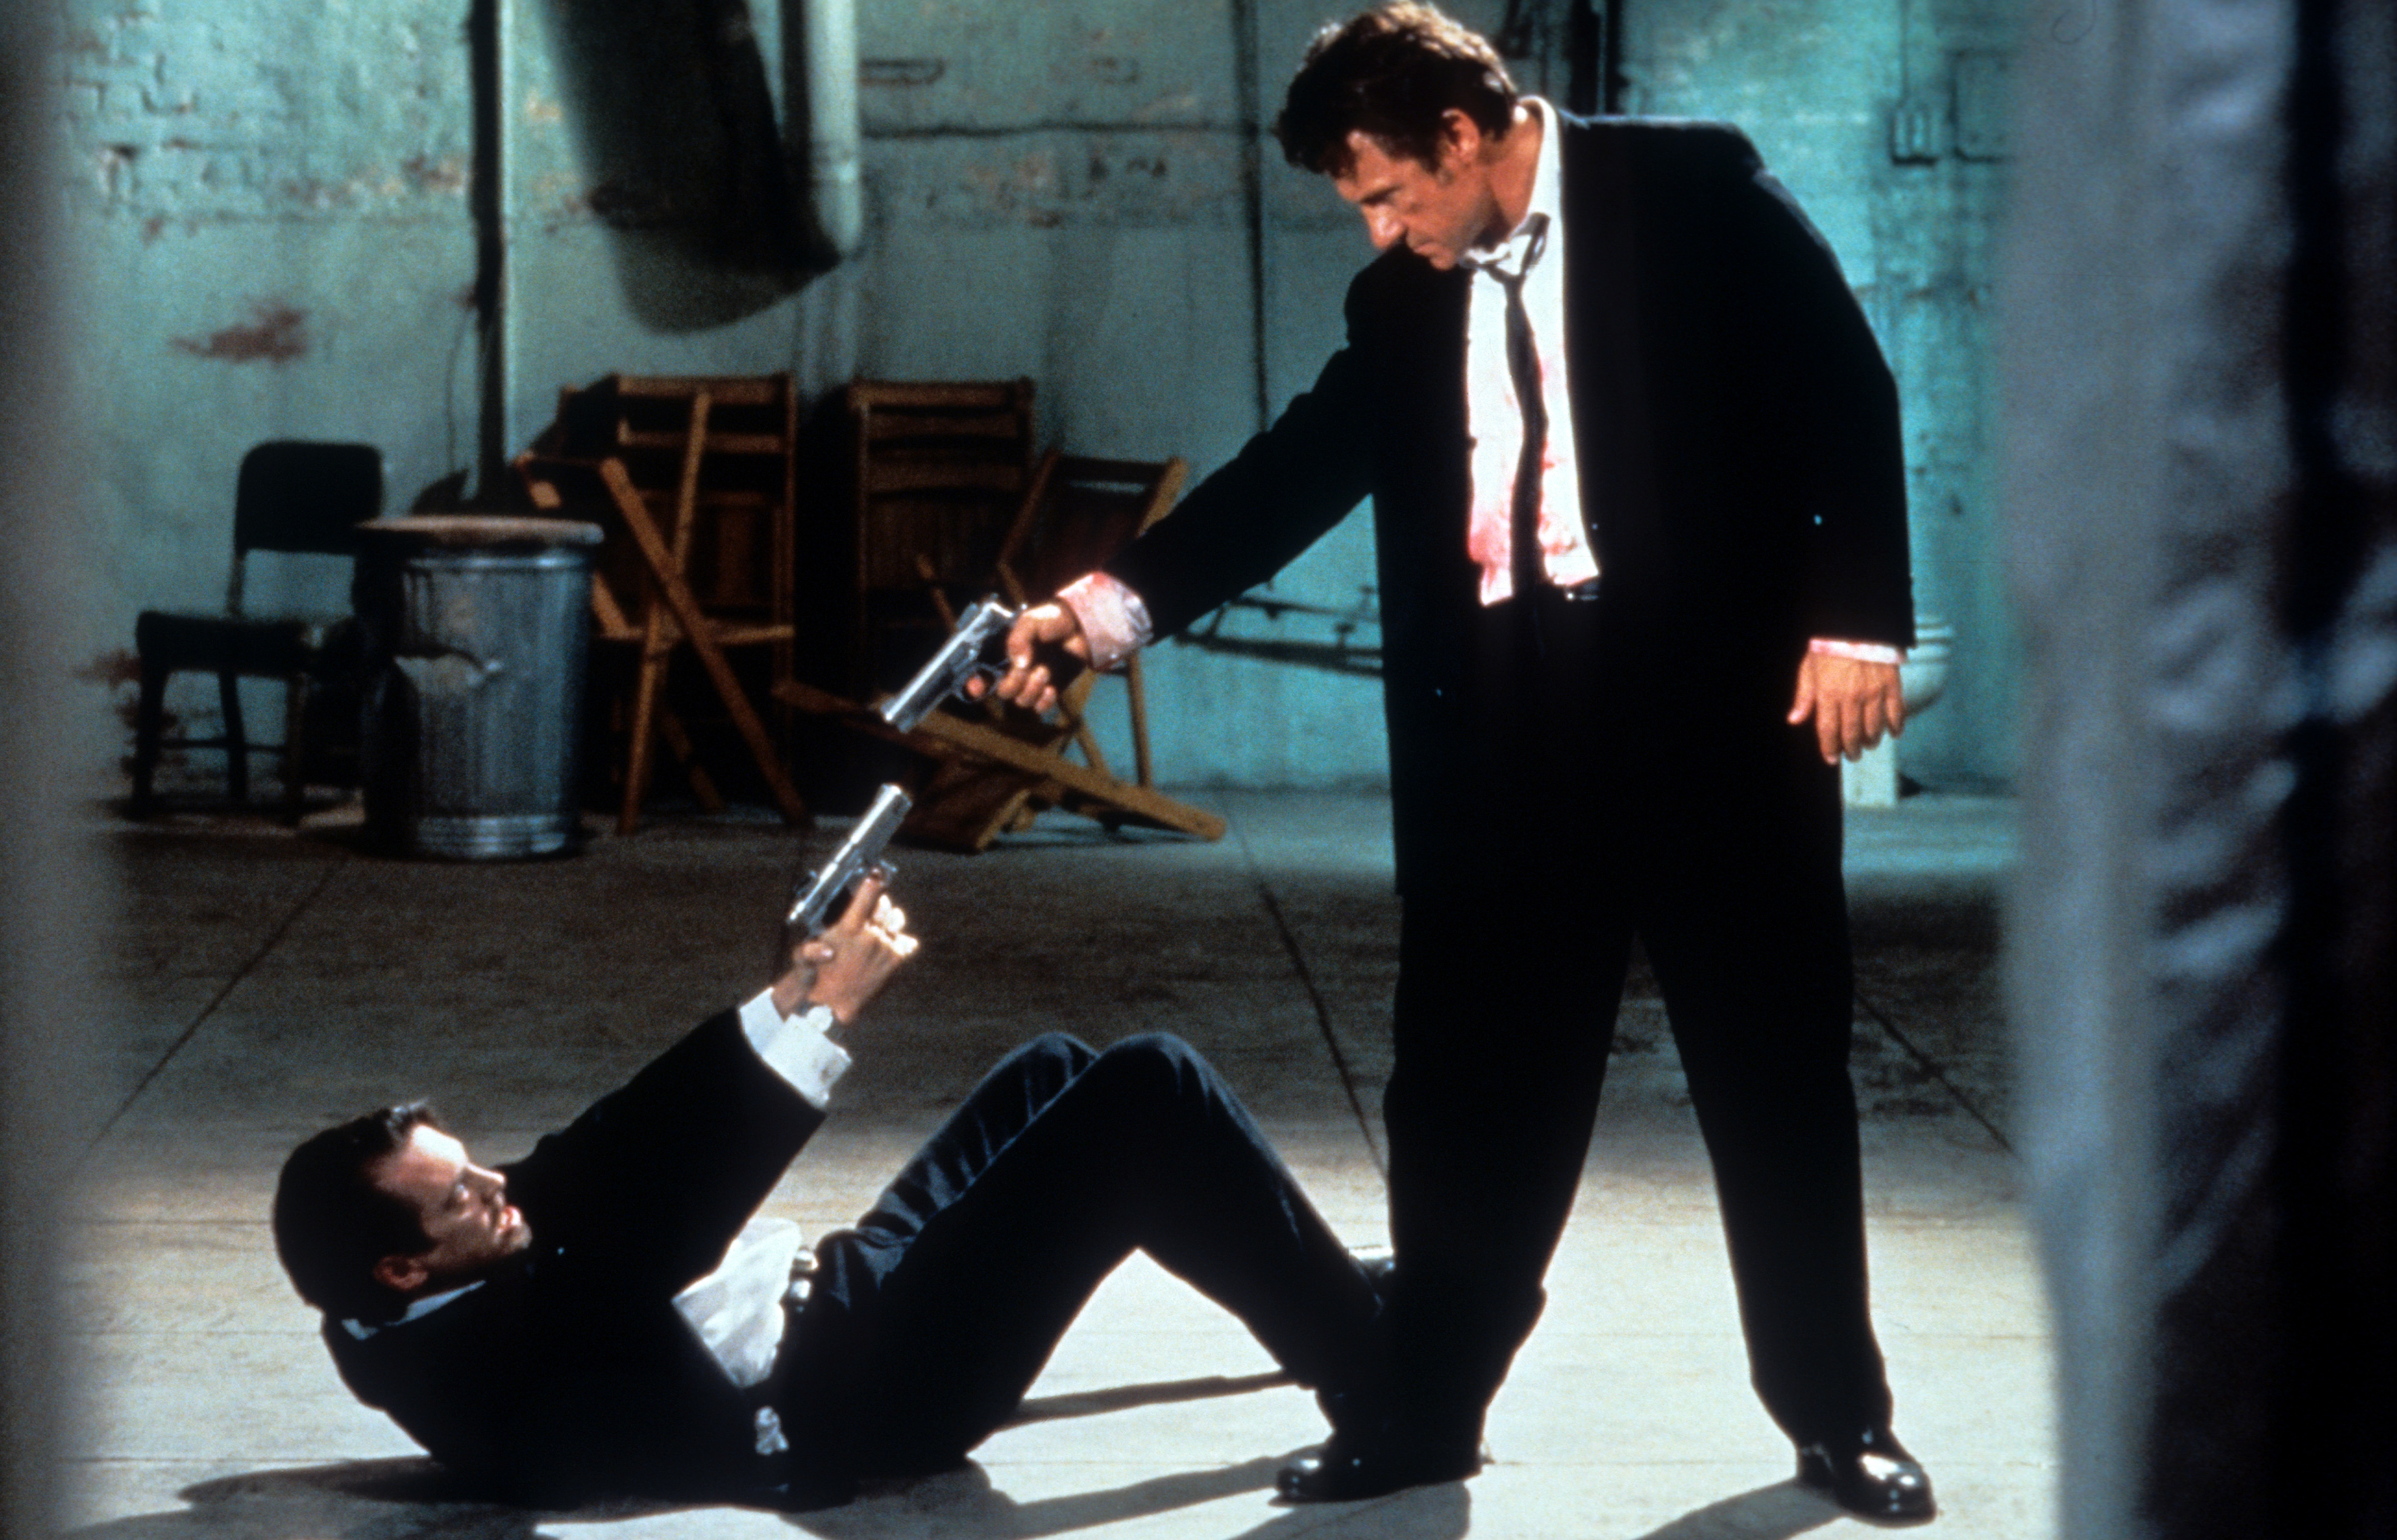 Steve Buscemi and Harvey Keitel in Reservoir Dogs (1992)